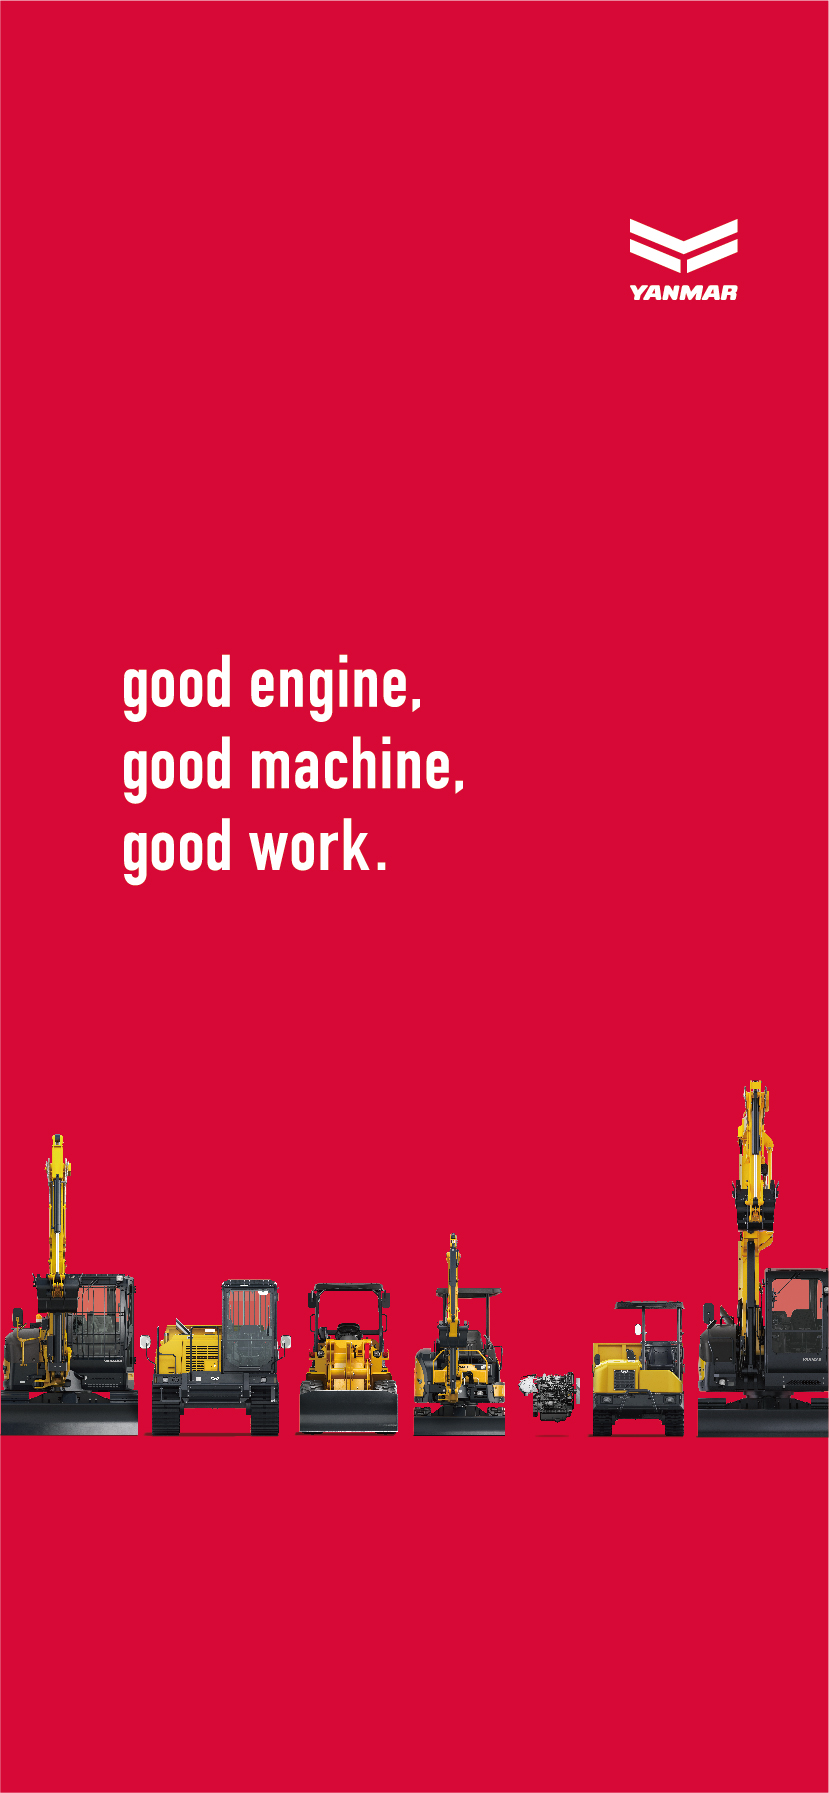 Enjoy With Yanmar建機 建設機械 ヤンマー